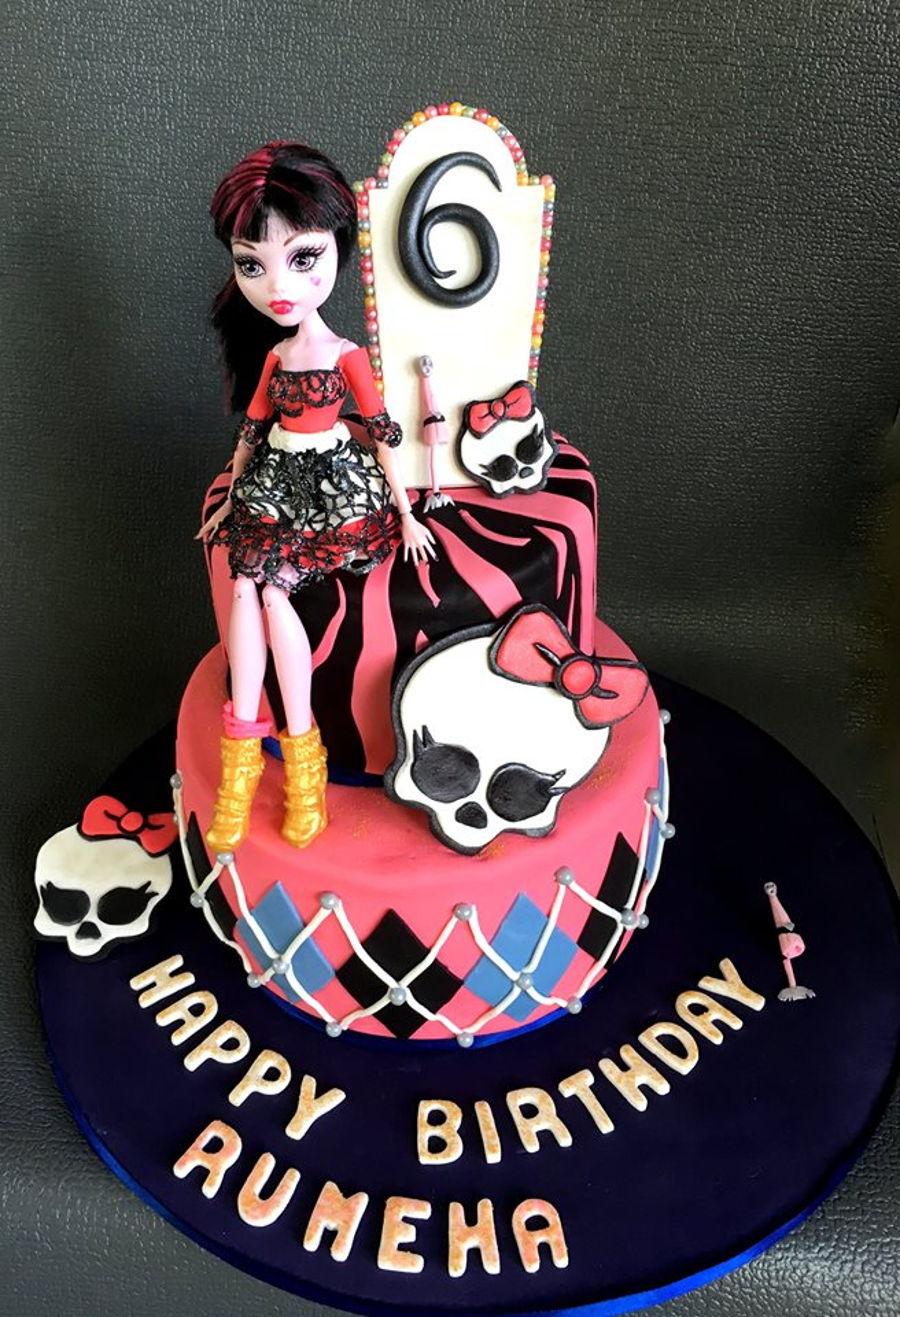 Tremendous Monster High Draculaura Cakecentral Com Funny Birthday Cards Online Hendilapandamsfinfo